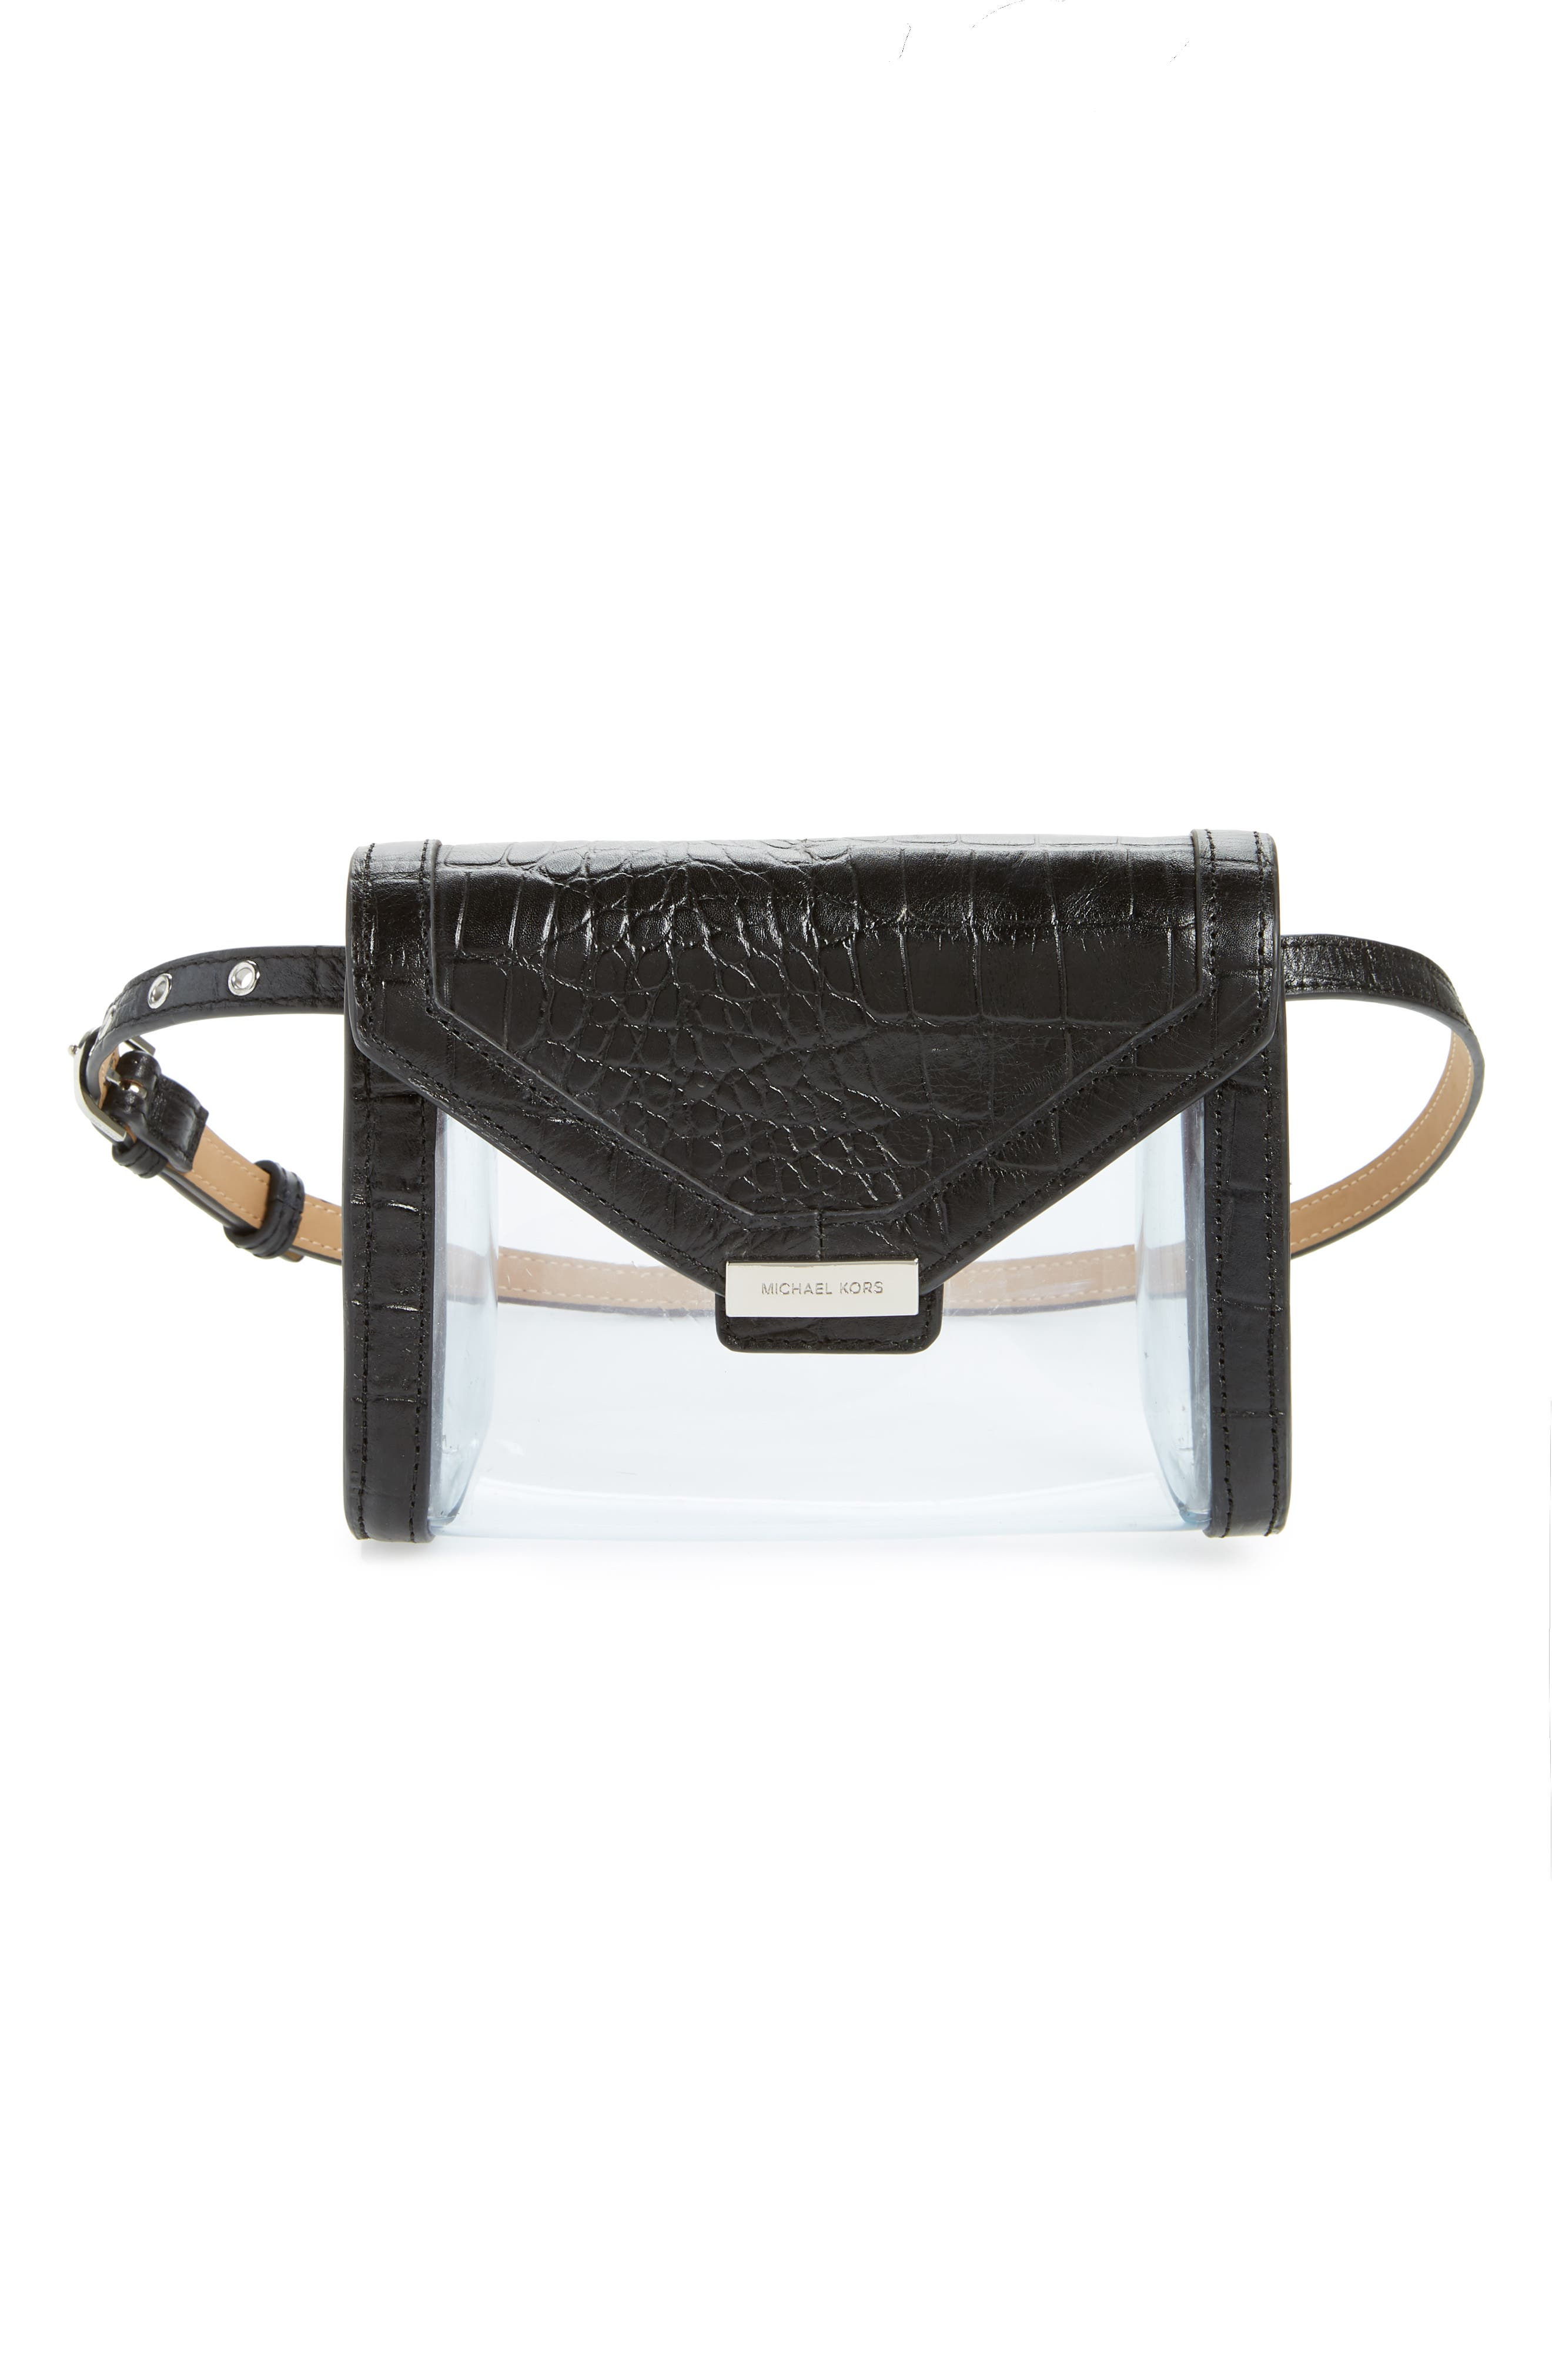 ef37cbc7524935 michael kors handbags | Nordstrom